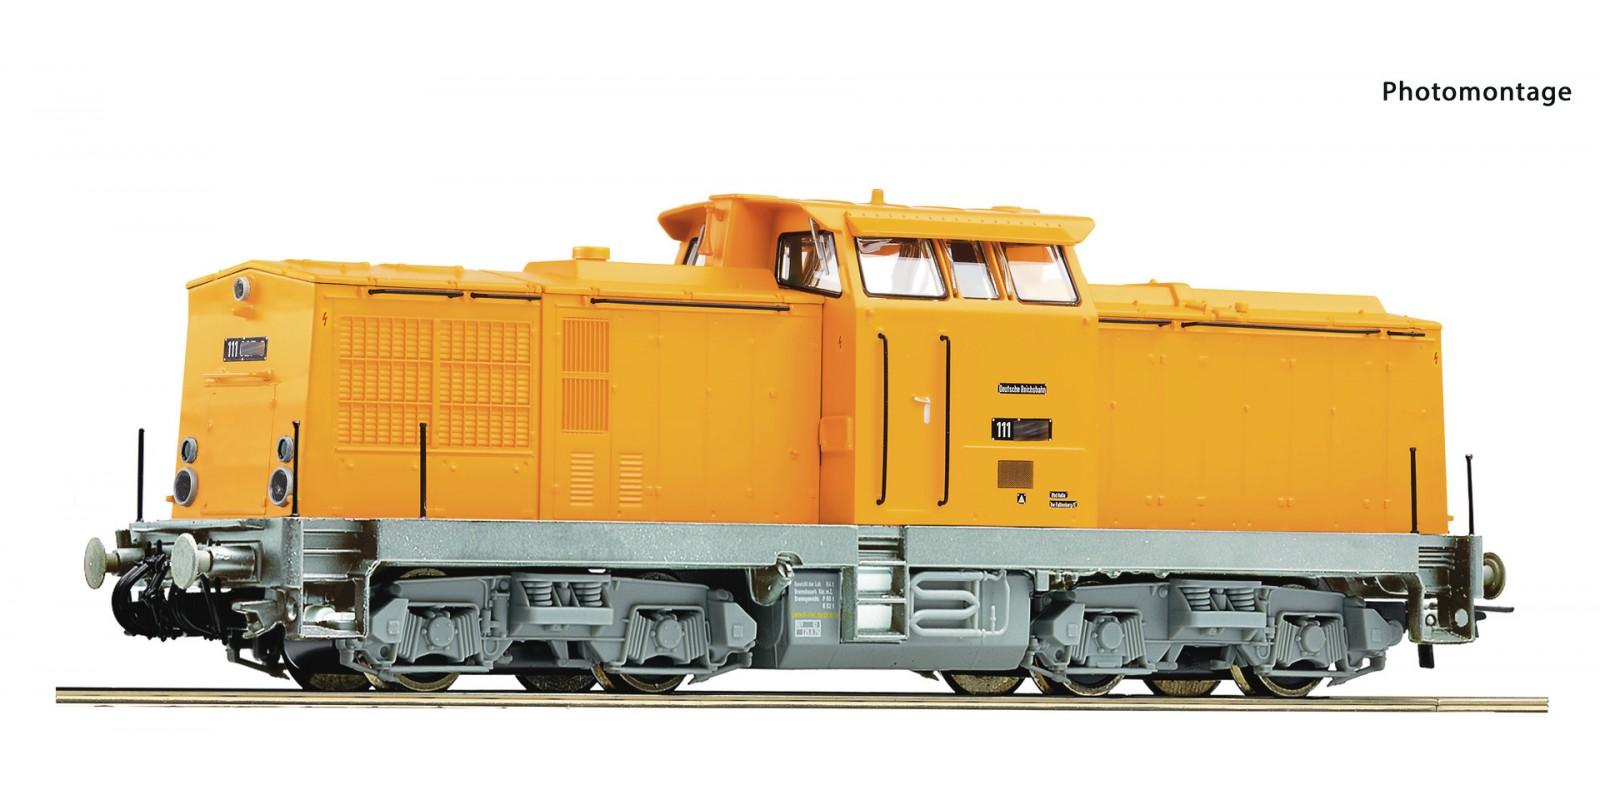 RO78814 Diesel locomotive class 111